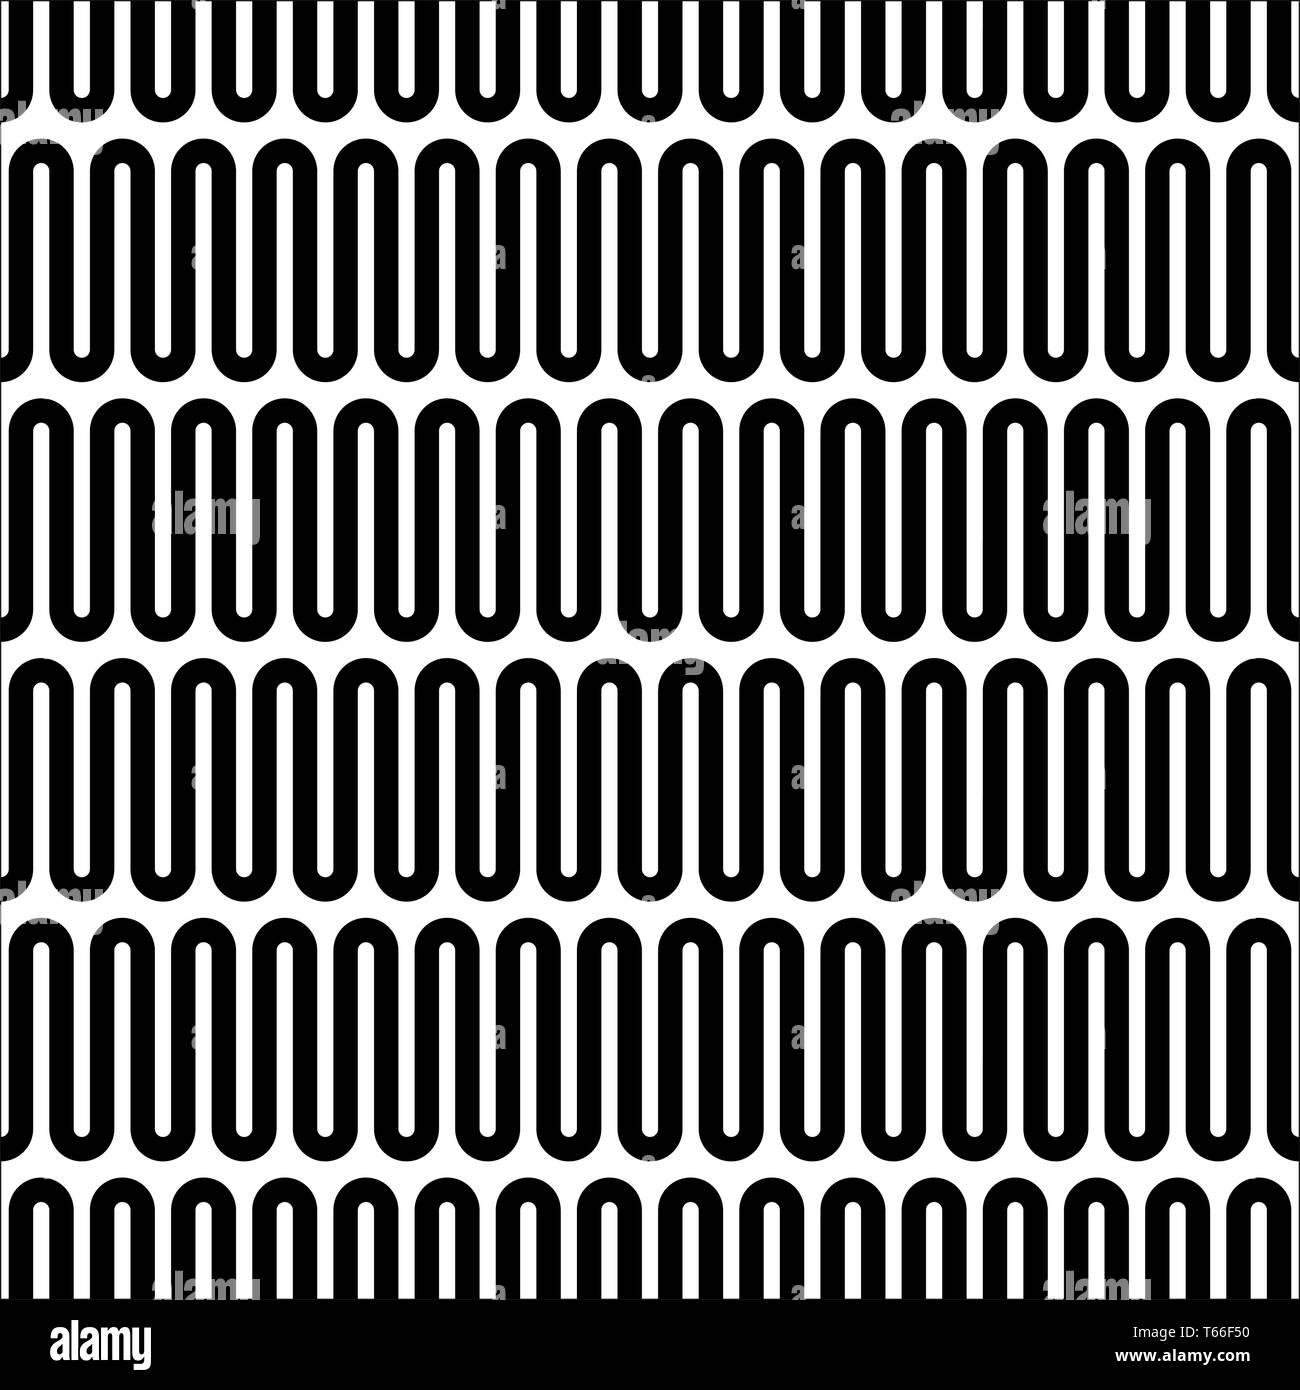 Horizontal wavy lines seamless pattern  Abstract vector